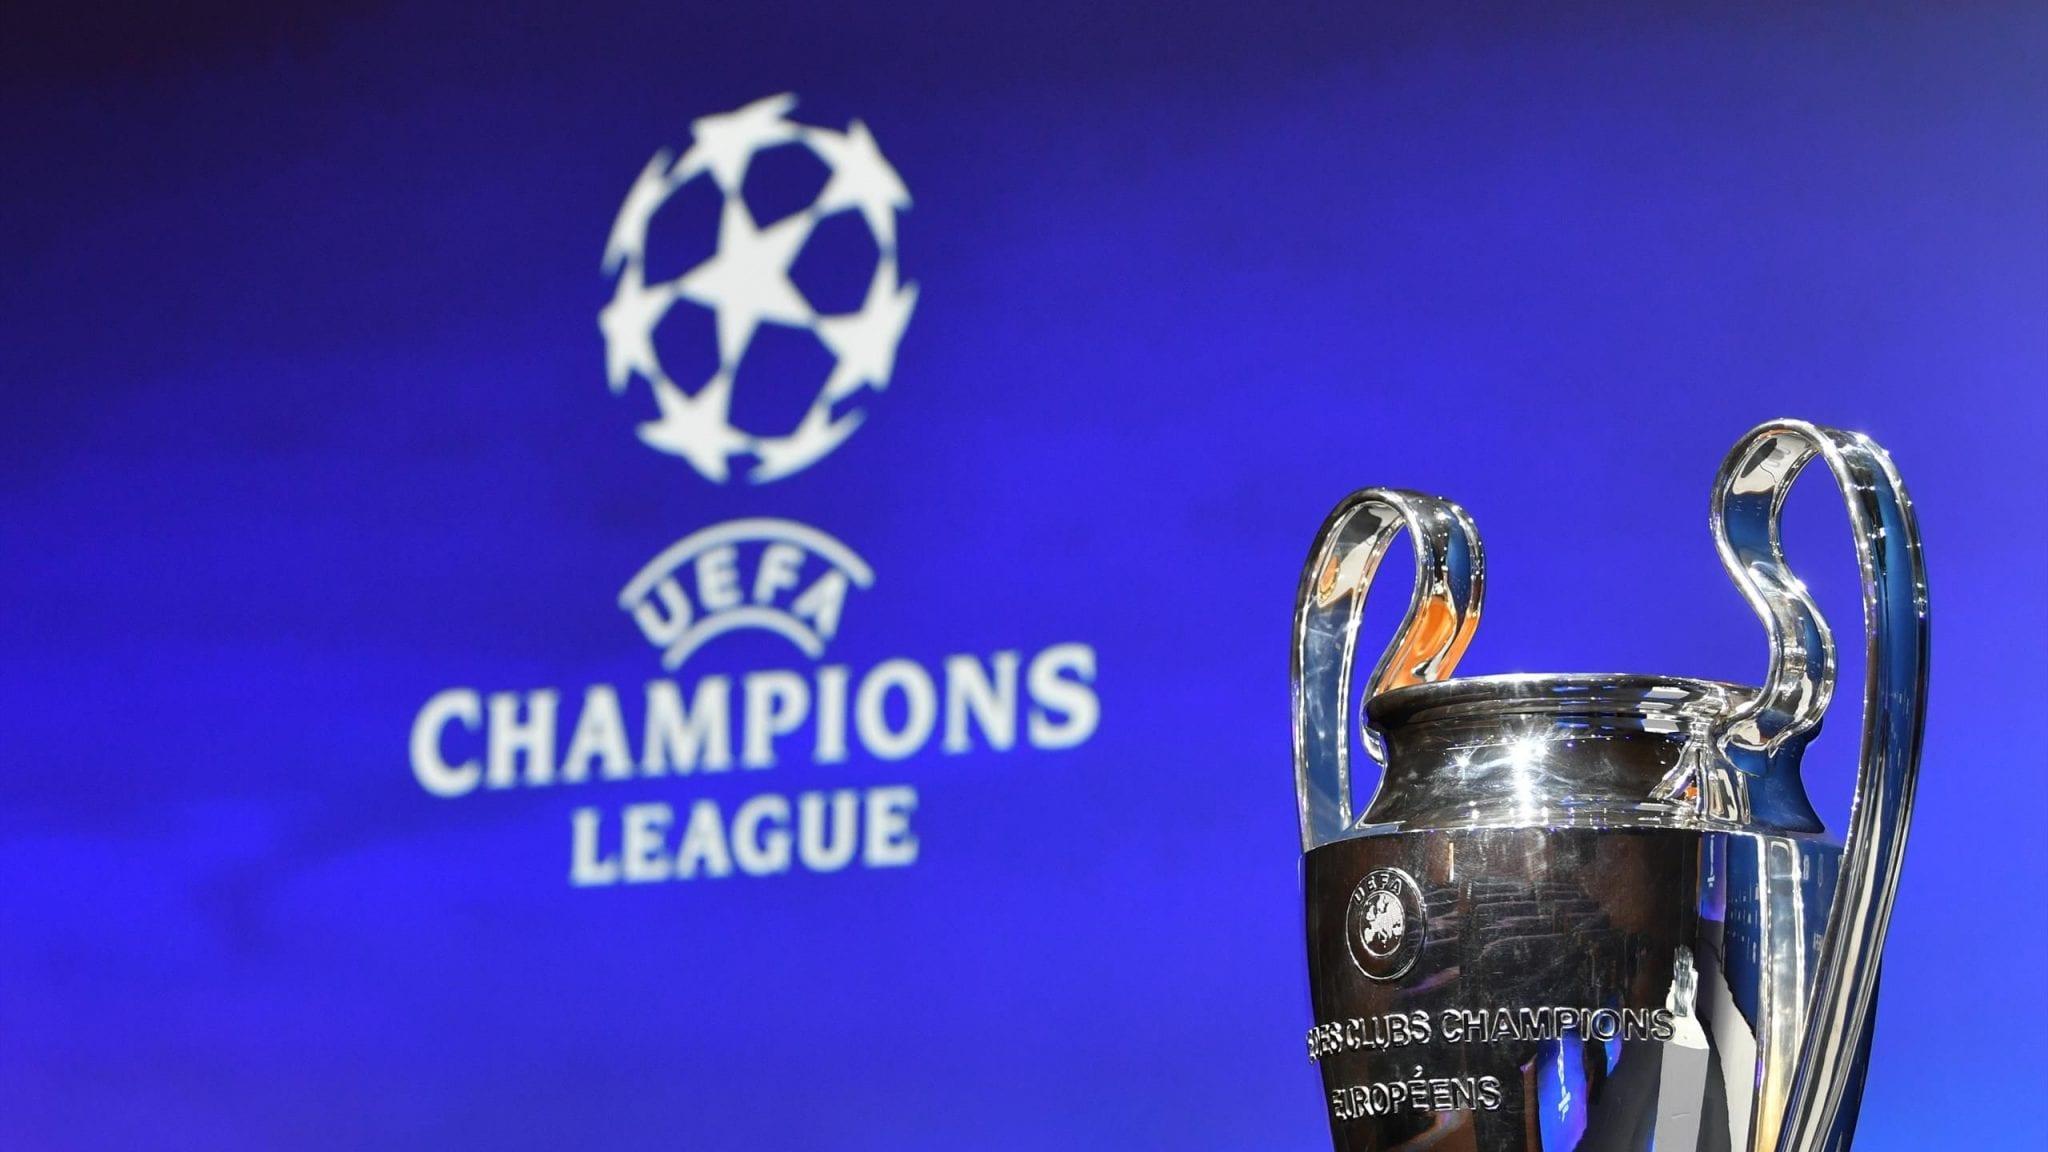 Prima semifinale di Champions League: Lipsia vs Paris Saint Germain